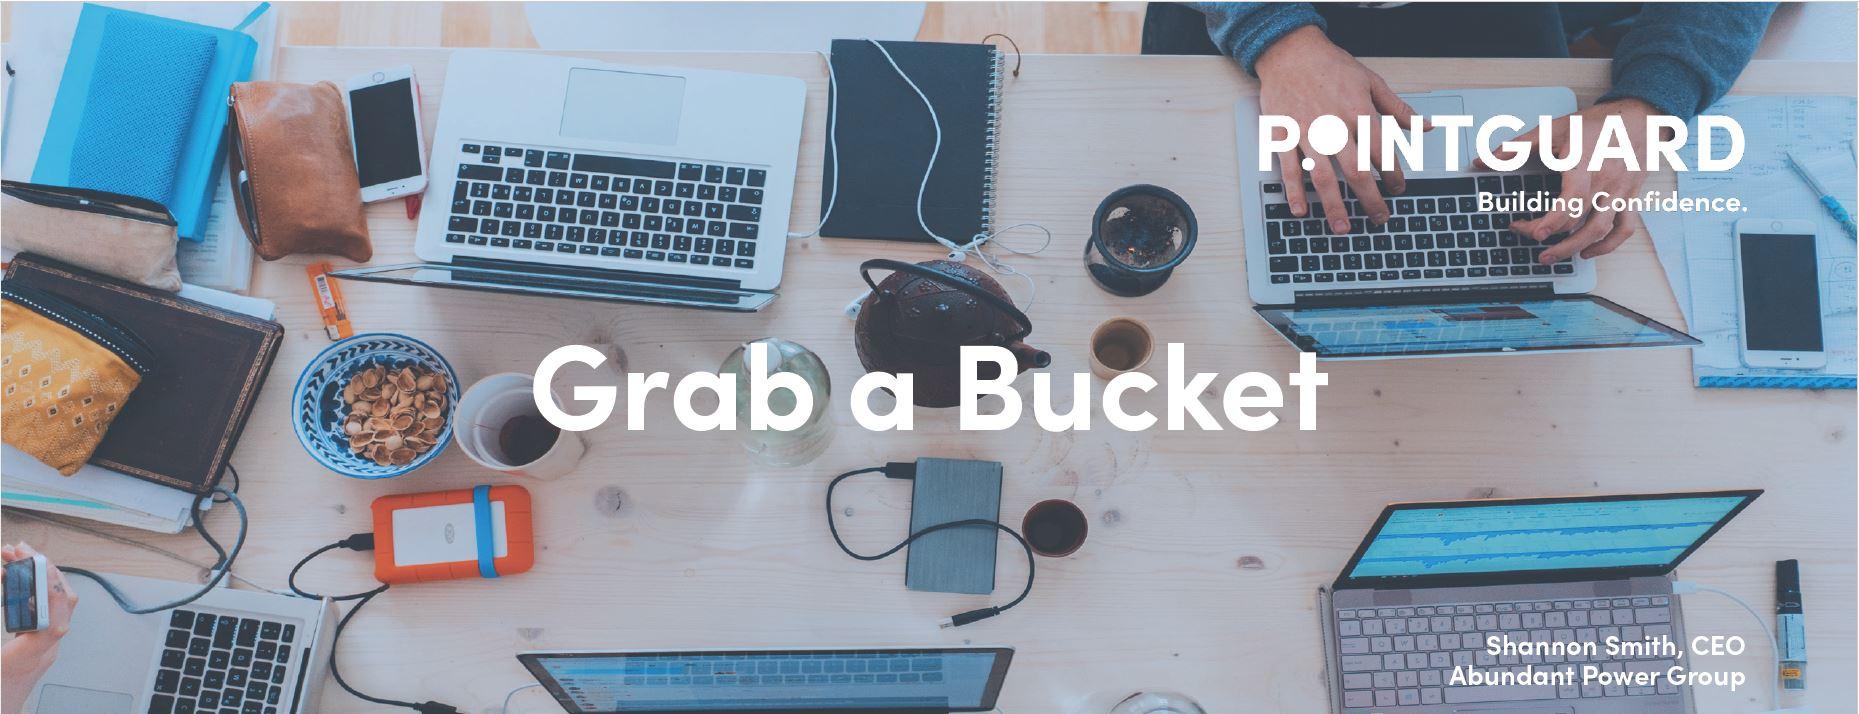 Grab a Bucket